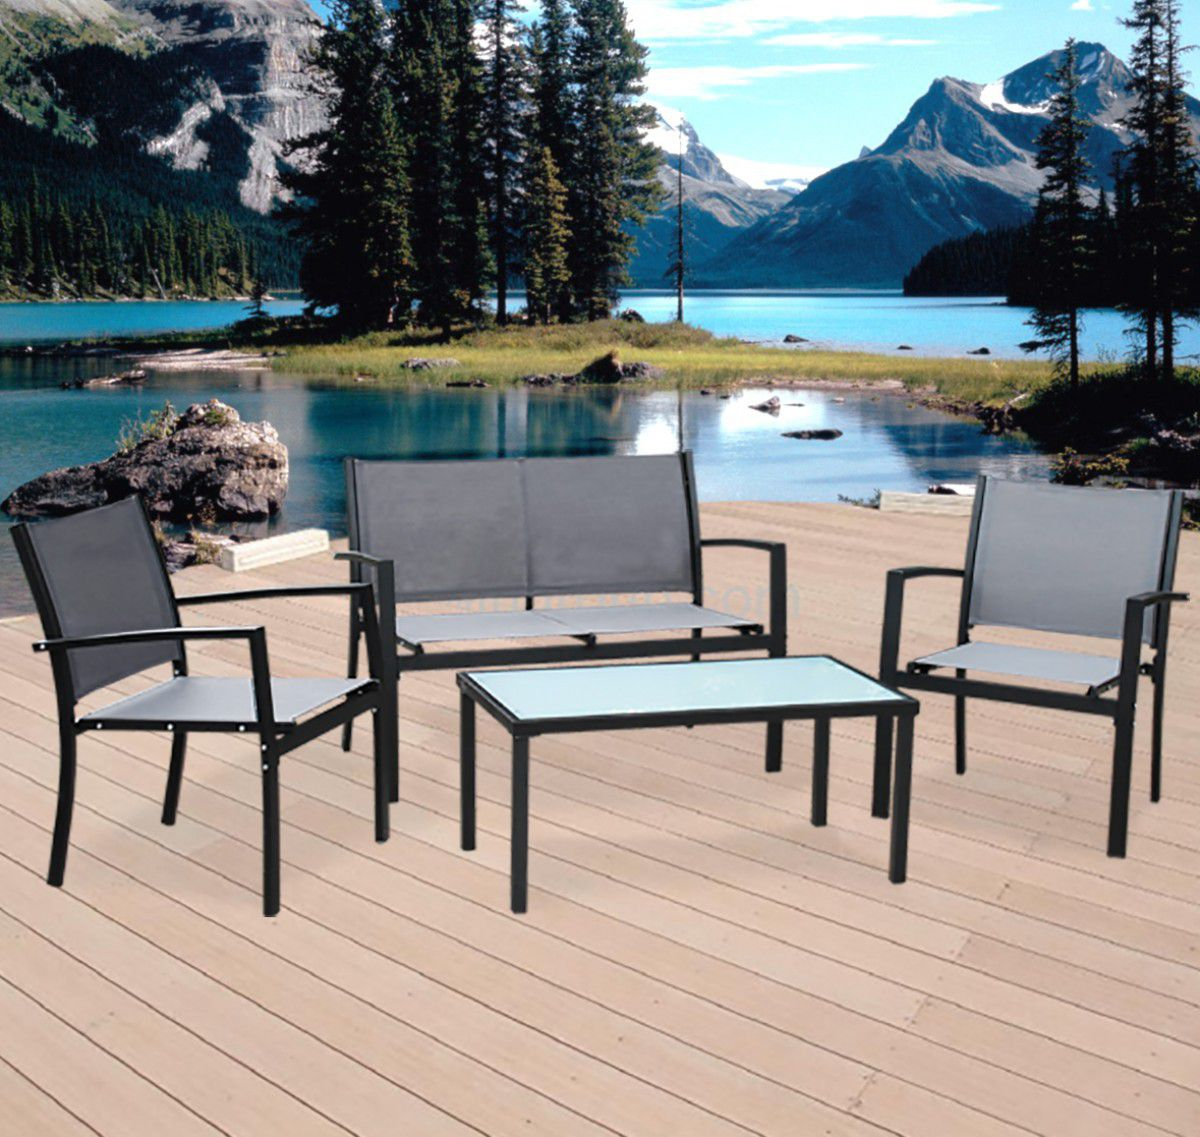 Fine Living - 4 Piece Outdoor Steel Furniture - Black ... on Fine Living Patio Set id=56166